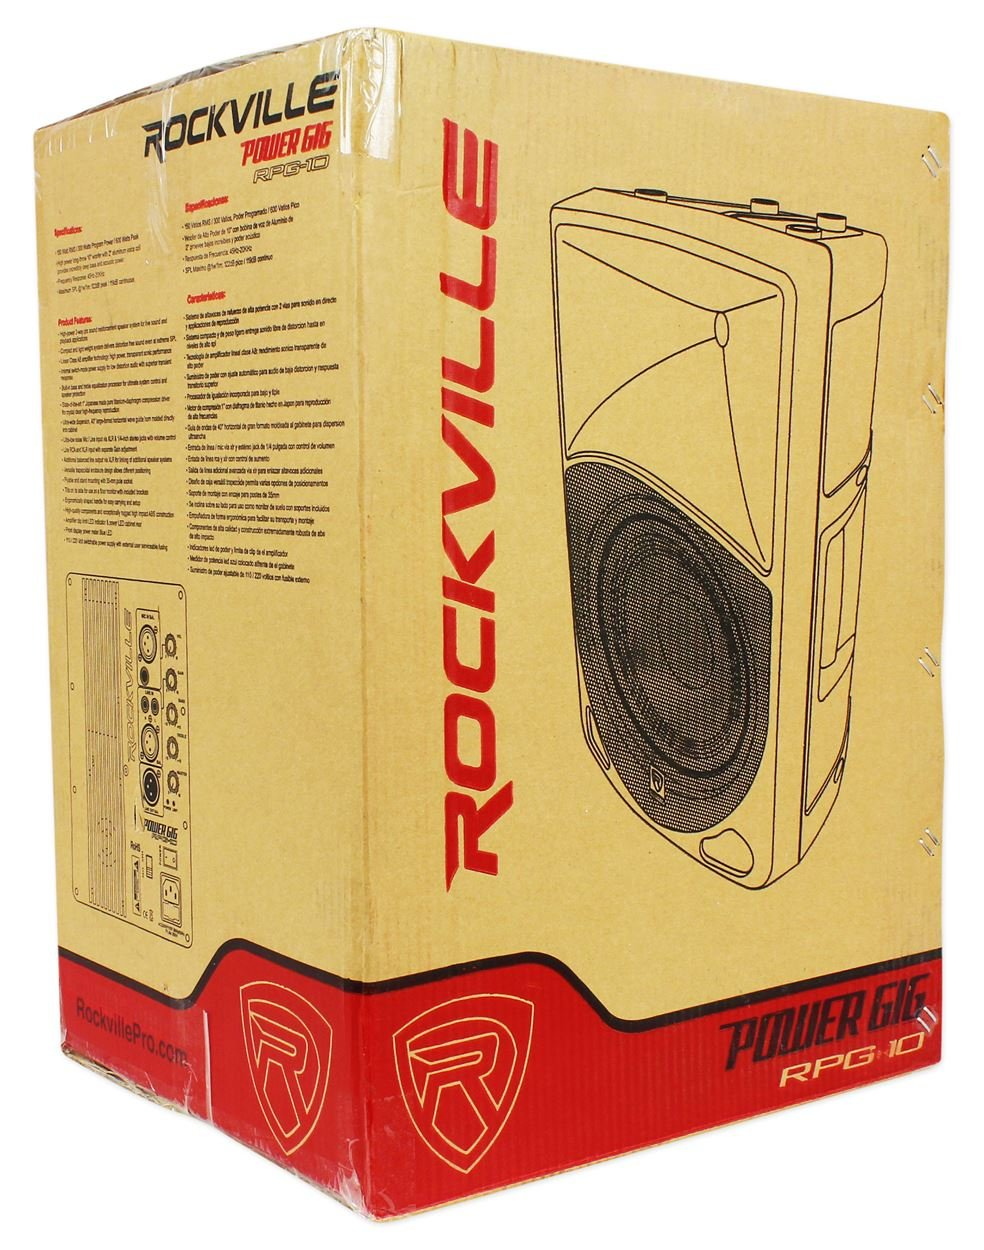 Pair Rockville Power Gig RPG10 10'' Powered Active 1200 Watt 2-Way DJ PA Speakers by Rockville